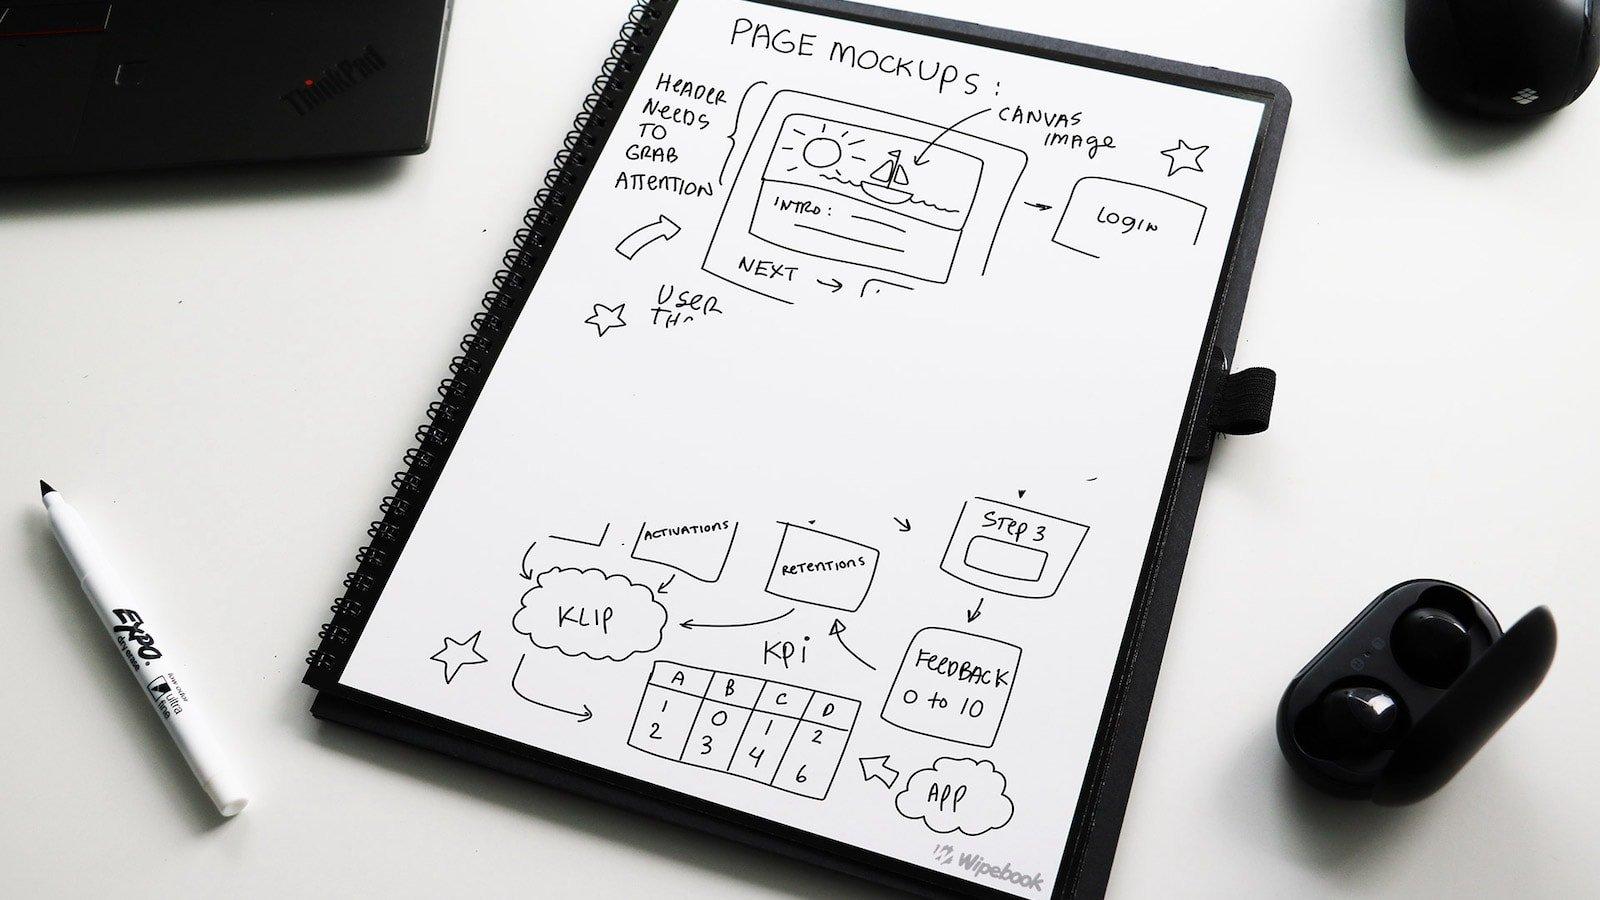 Wipebook Scan digital whiteboard uploads your ideas to cloud services like Google Drive